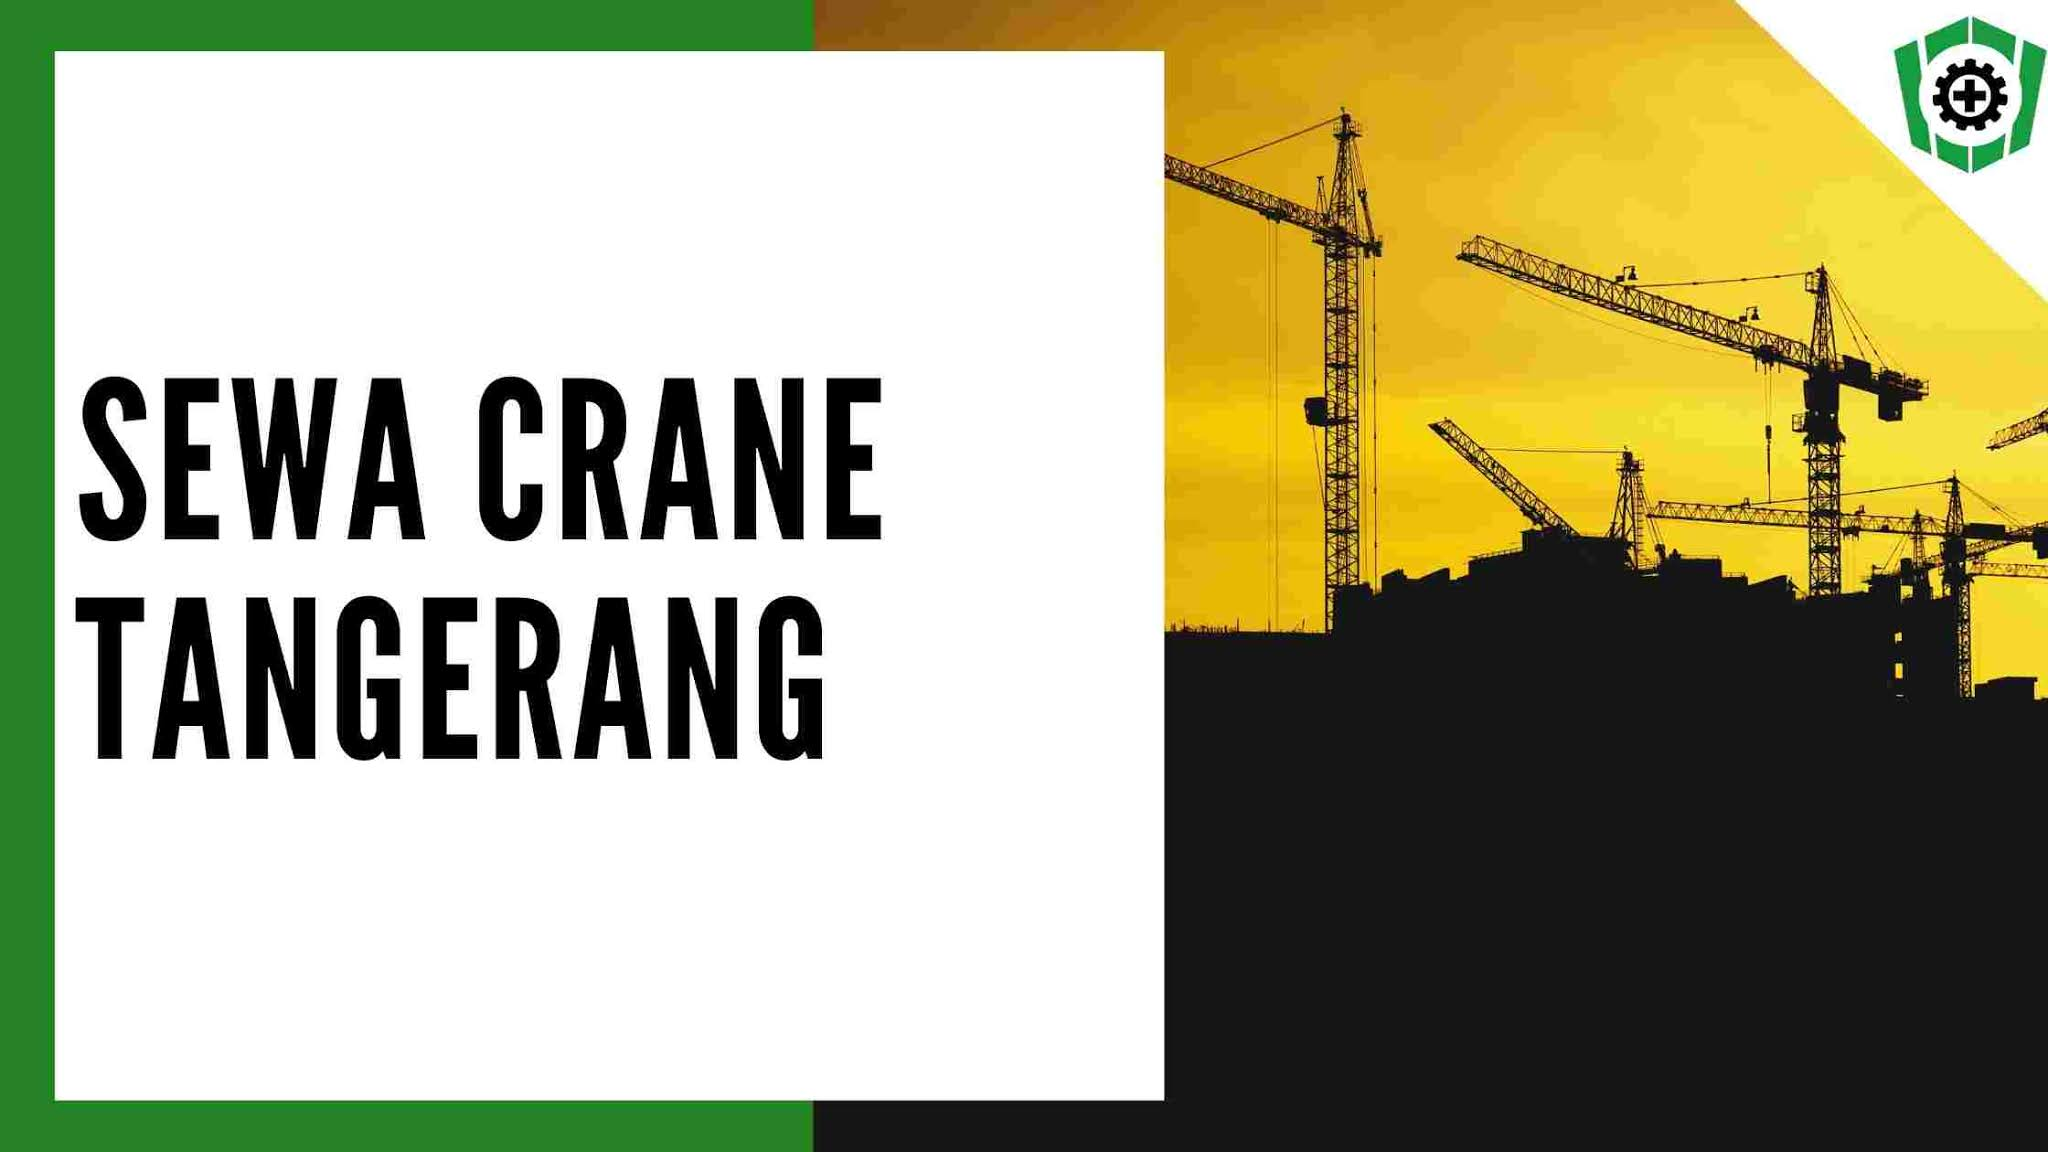 Sewa Crane Tangerang